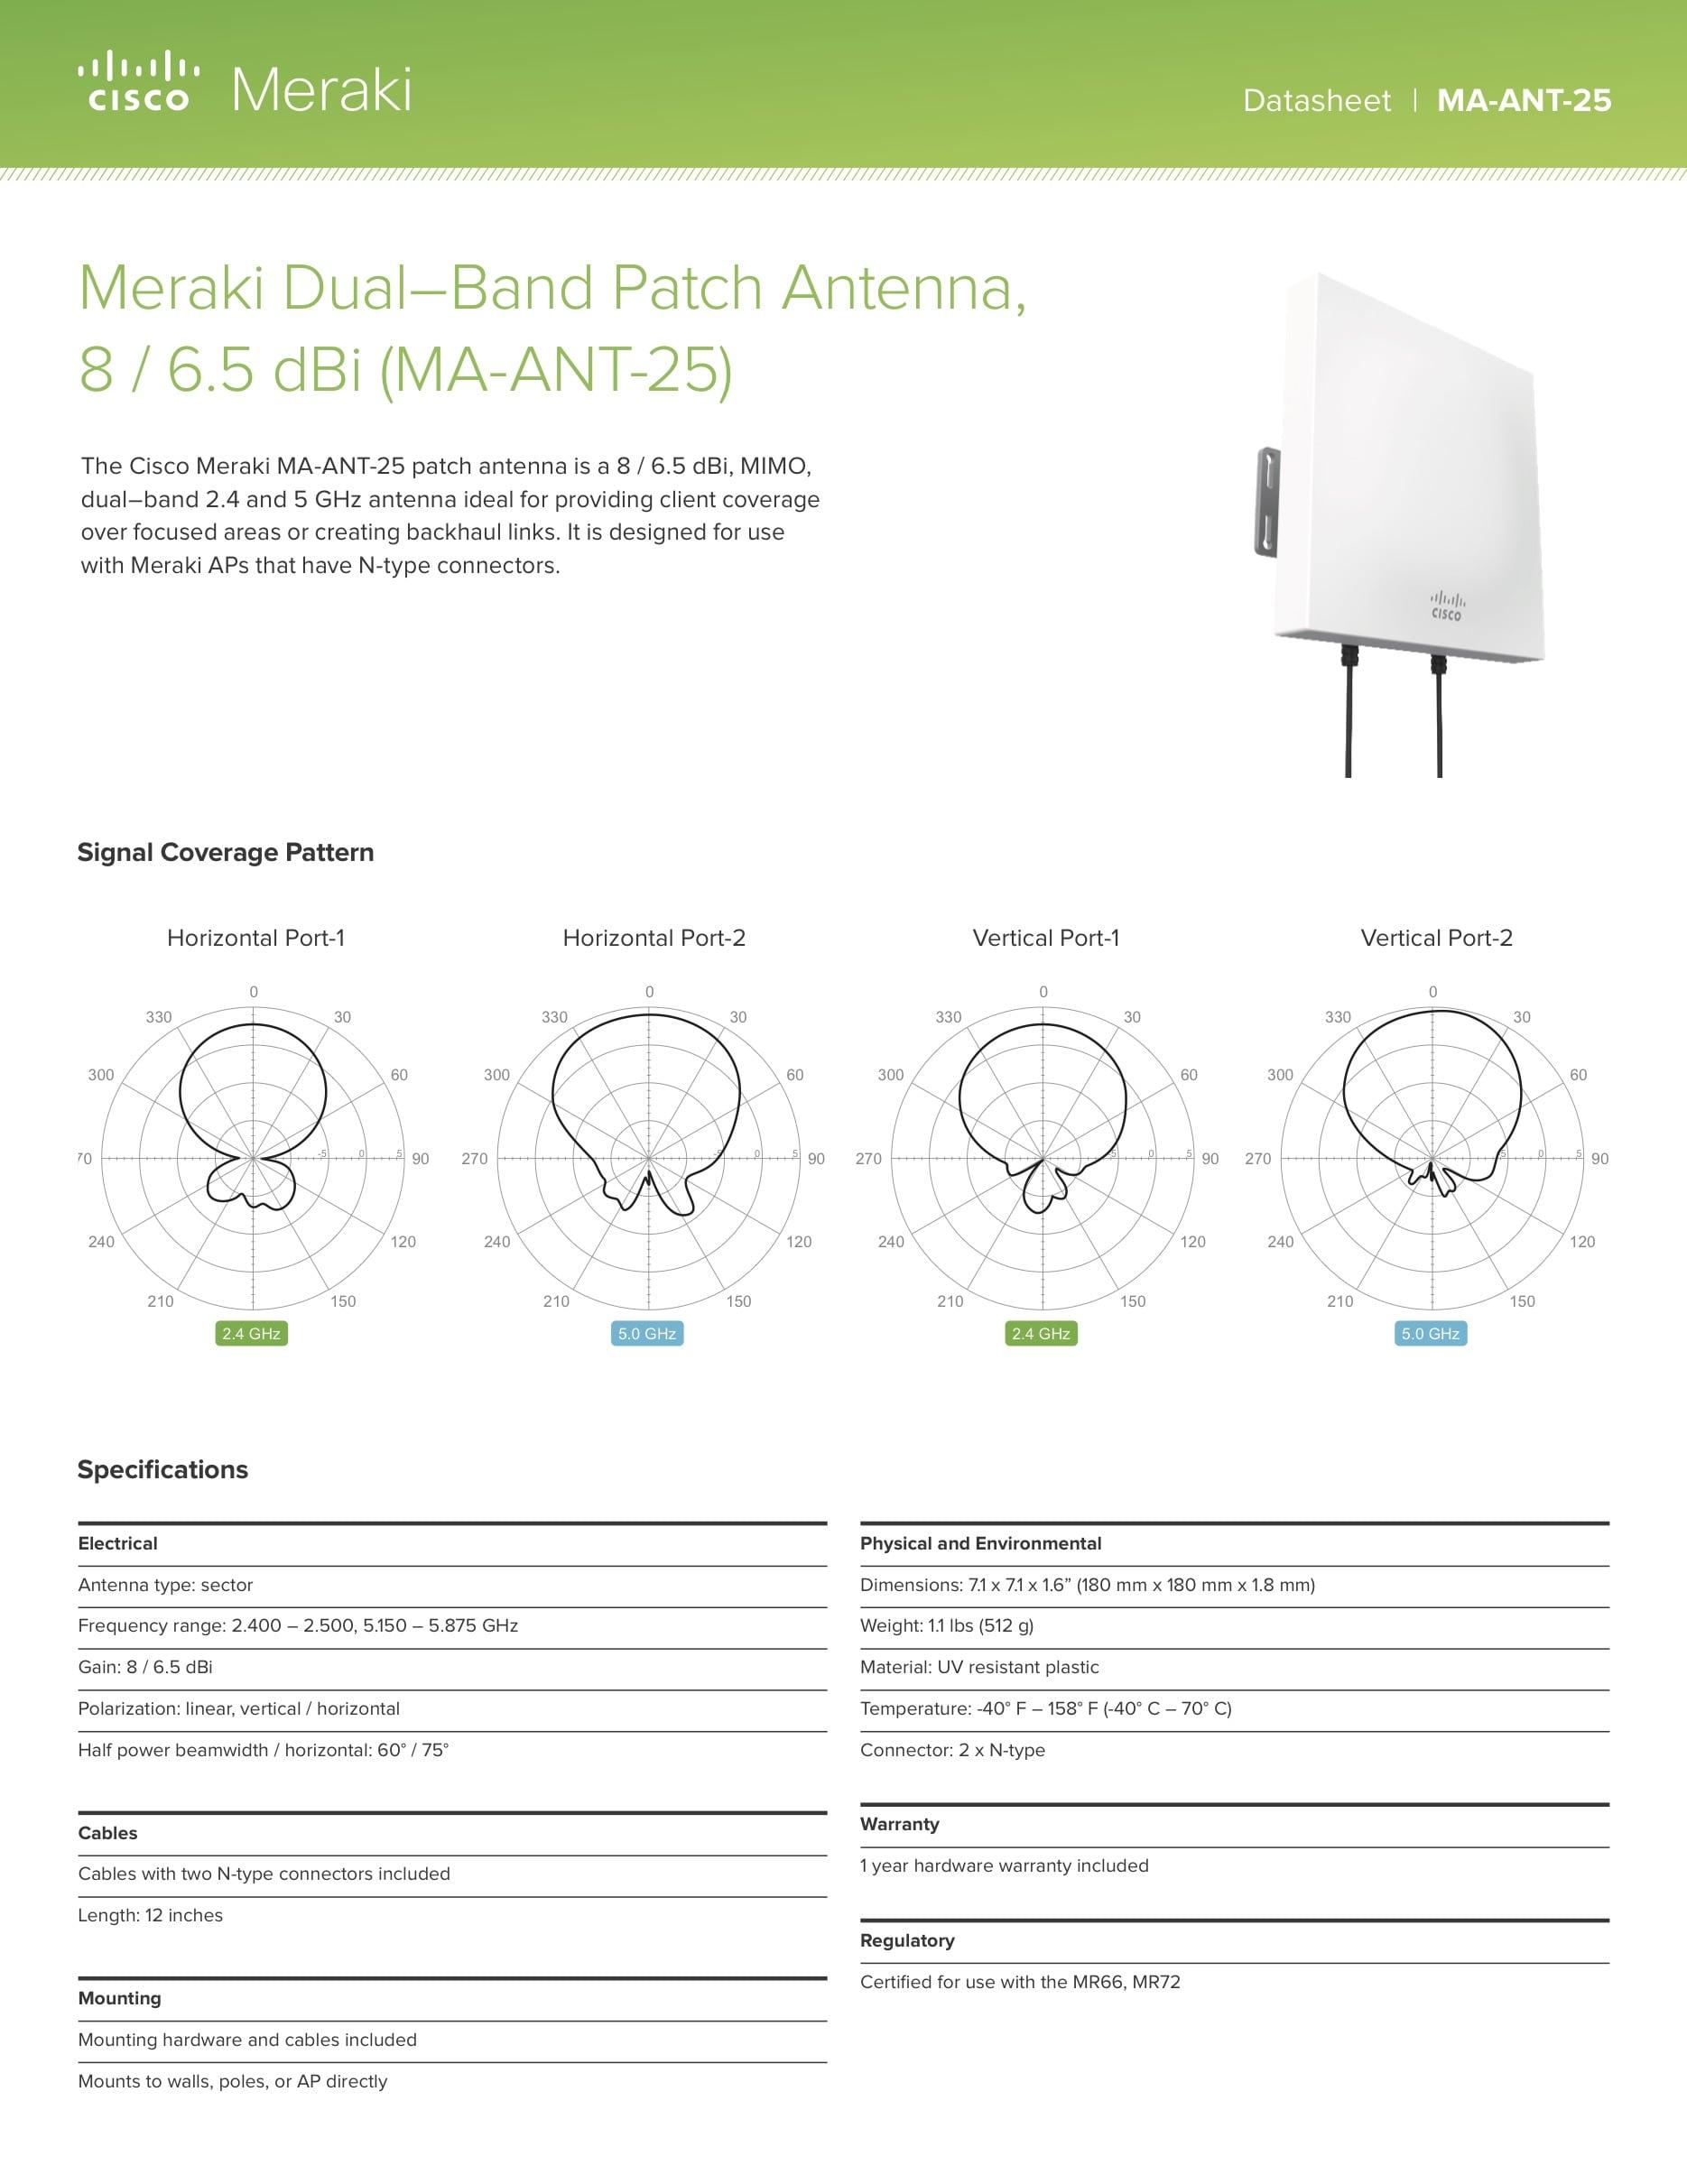 Dual-Band Patch Antenna Datasheet